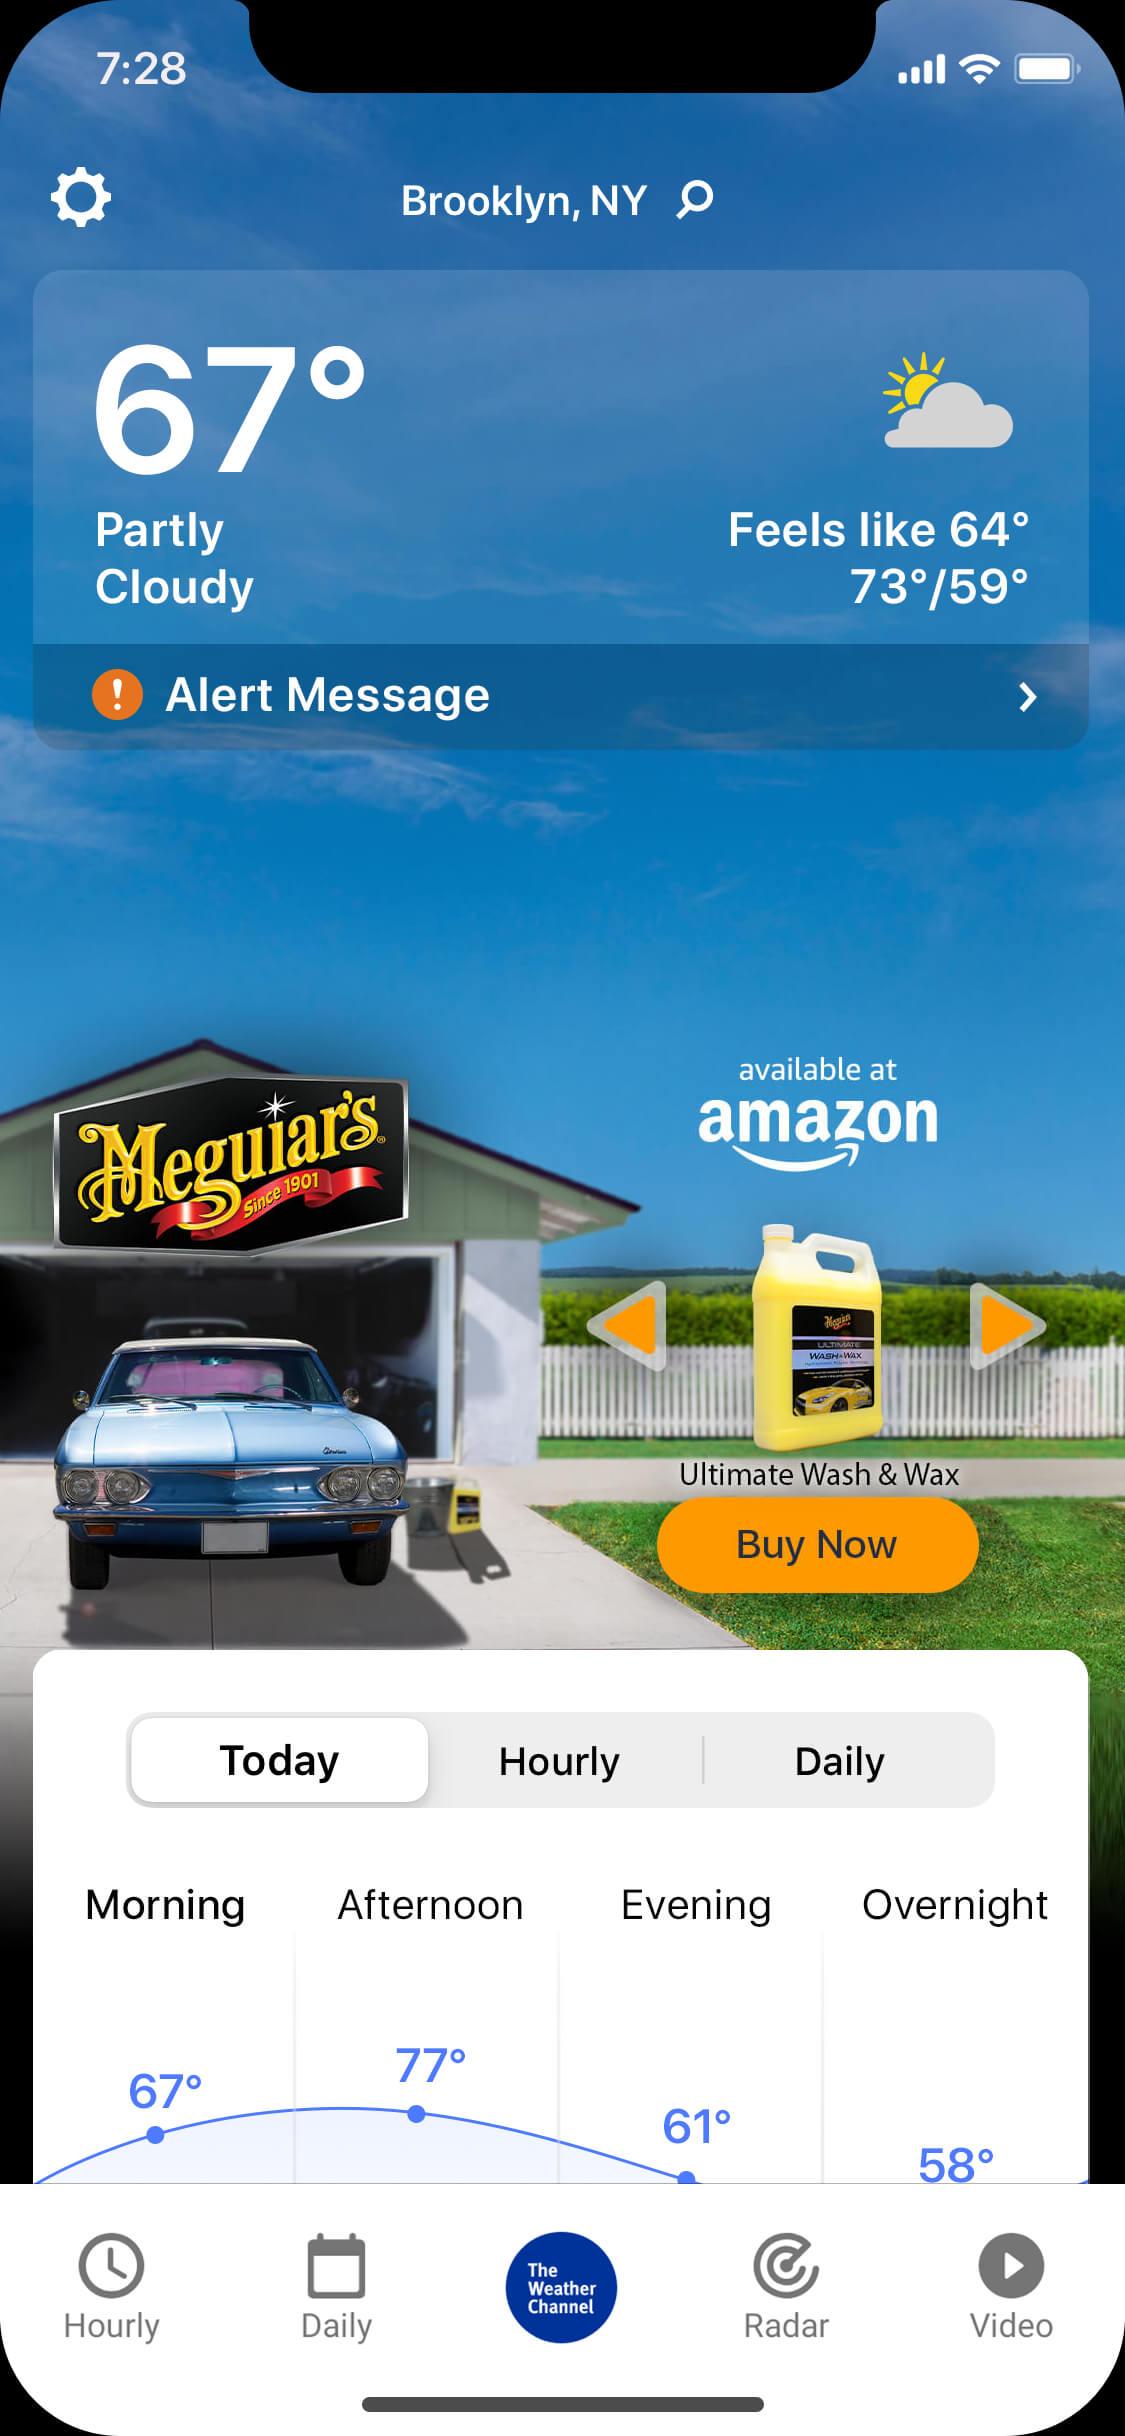 Amazon-Meguiar's-MAIM-Carousel_cloudy_day